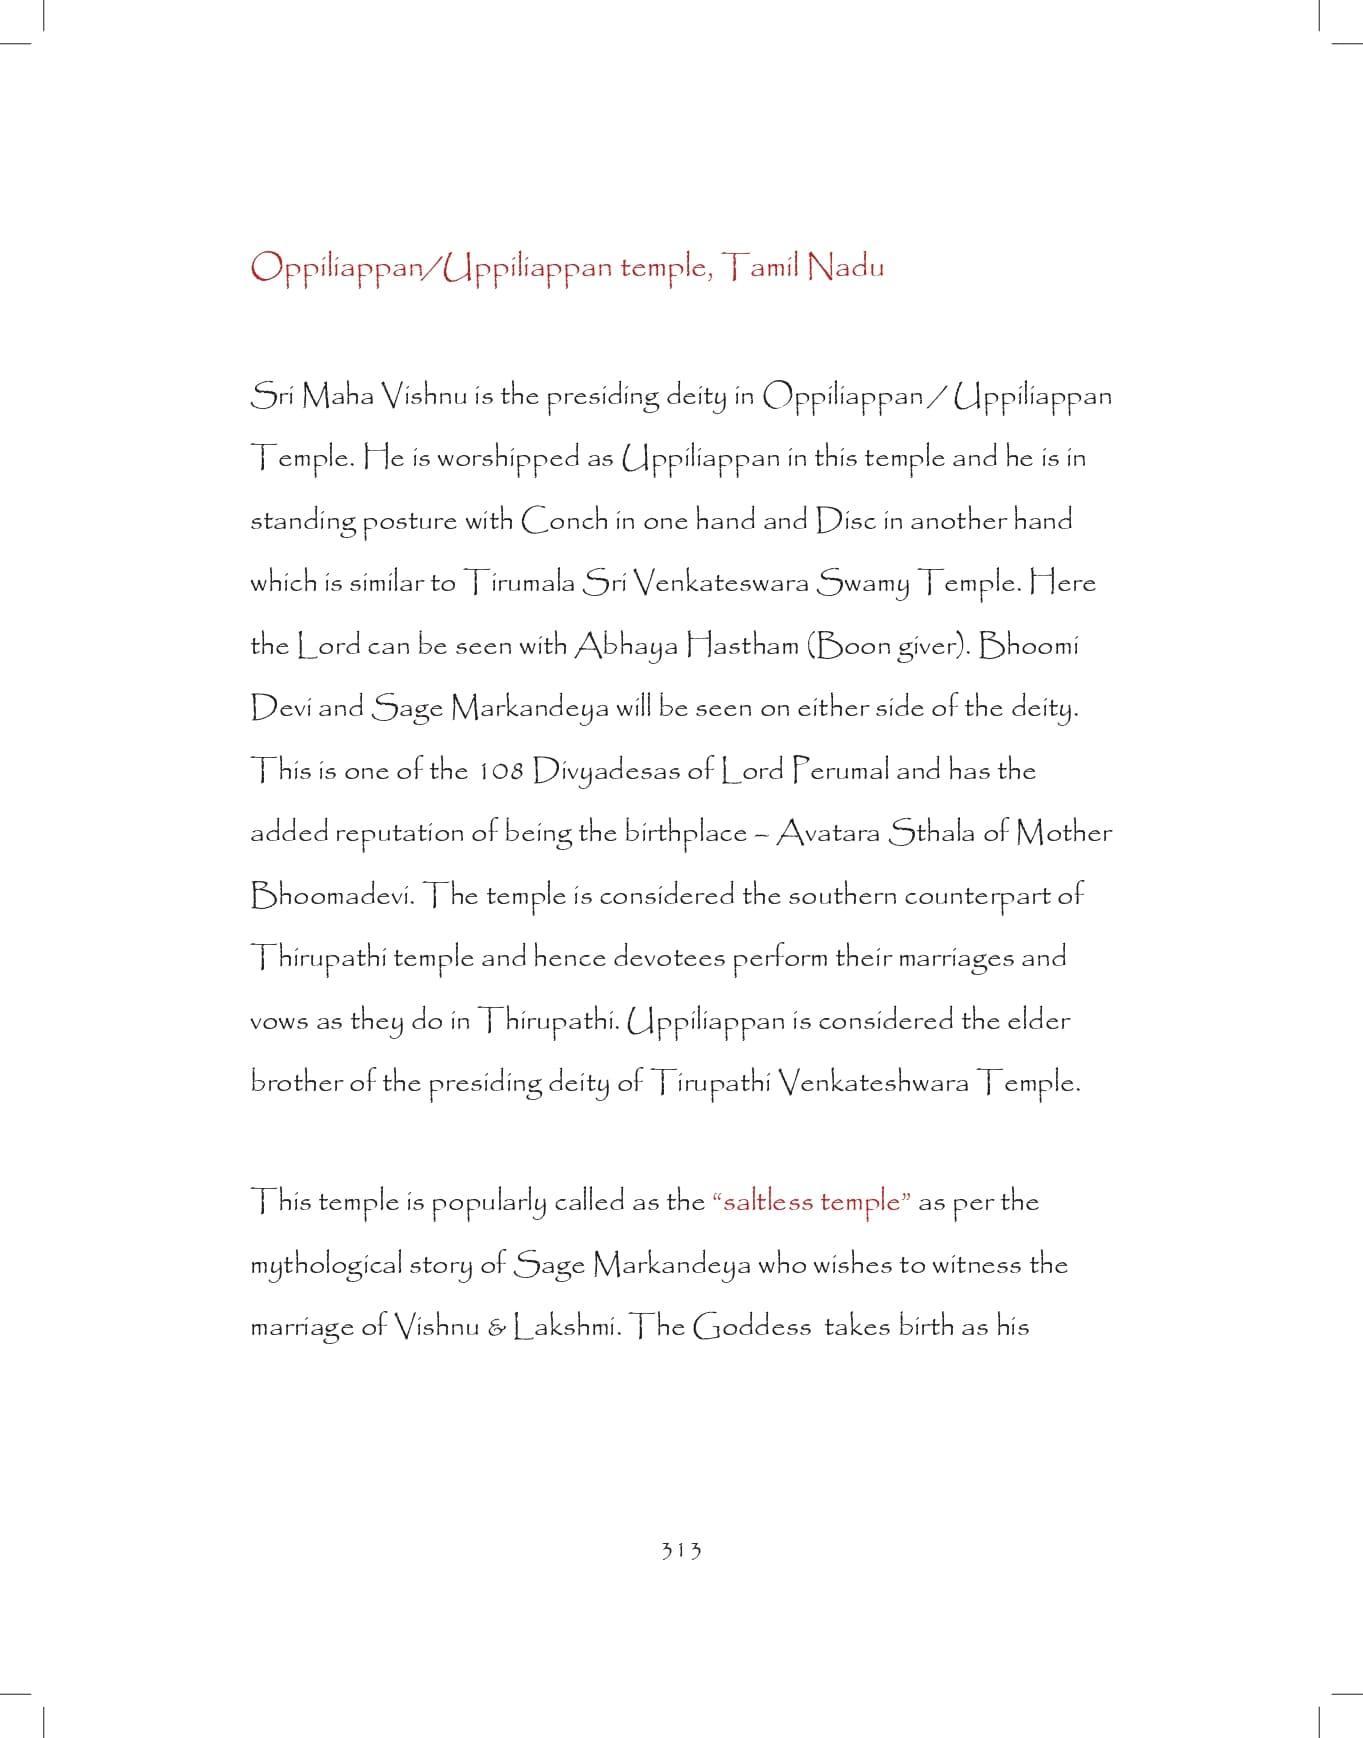 Ganesh-print_pages-to-jpg-0313.jpg